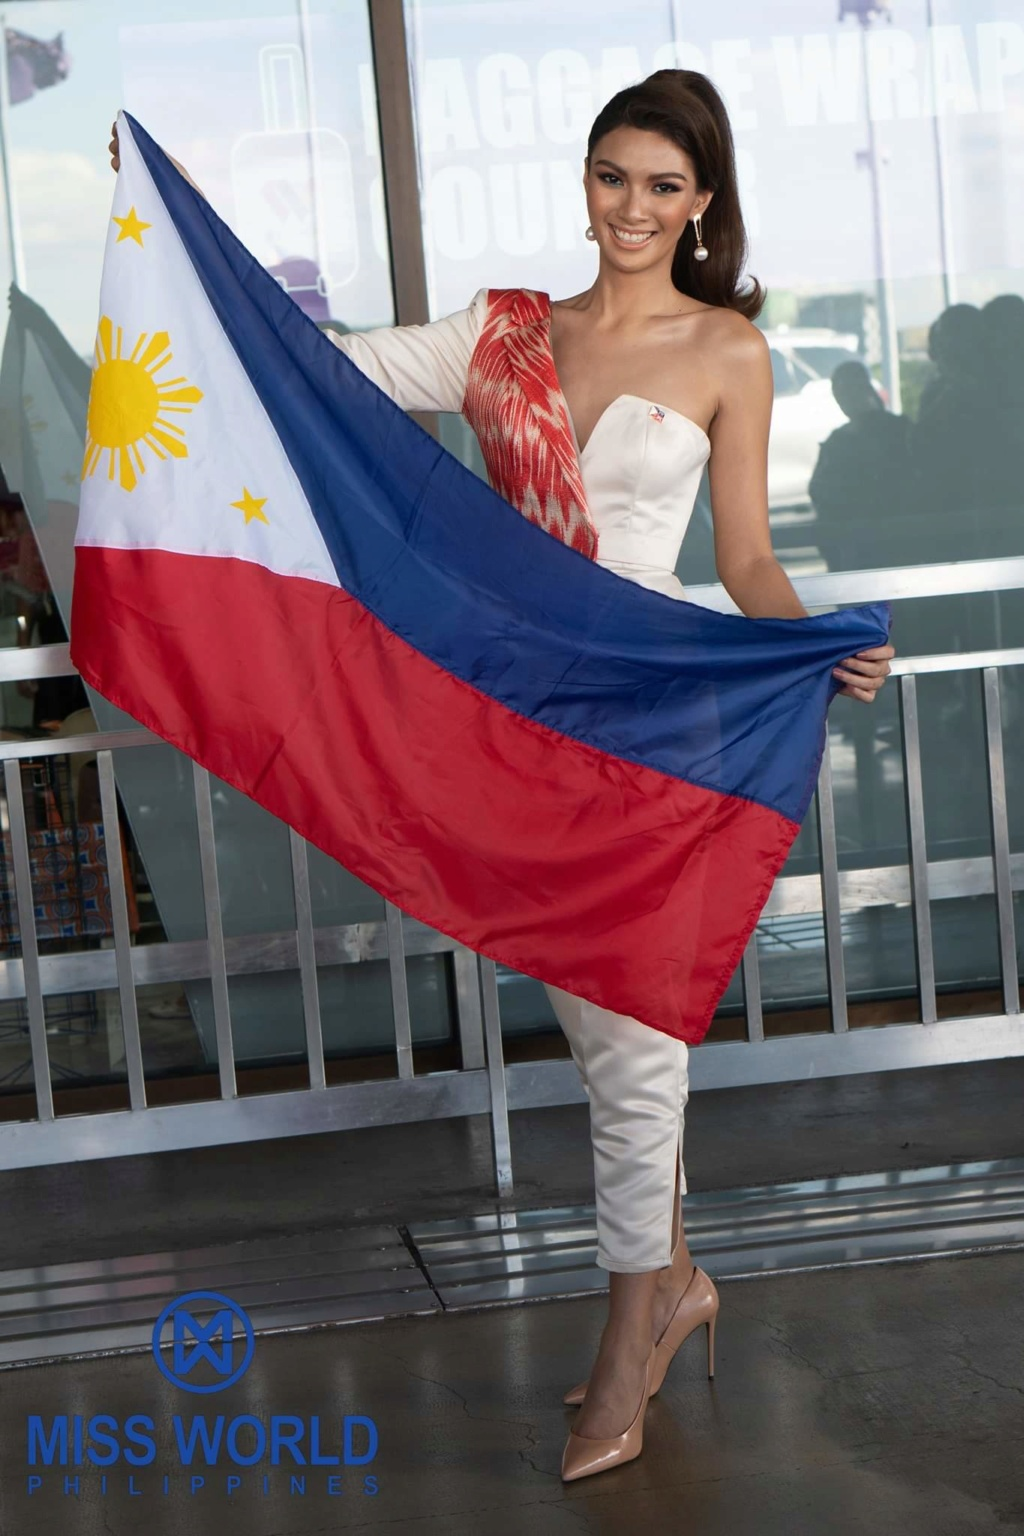 Reina Hispanoamericana Filipinas 2019: Katrina Llegado Fb_11798